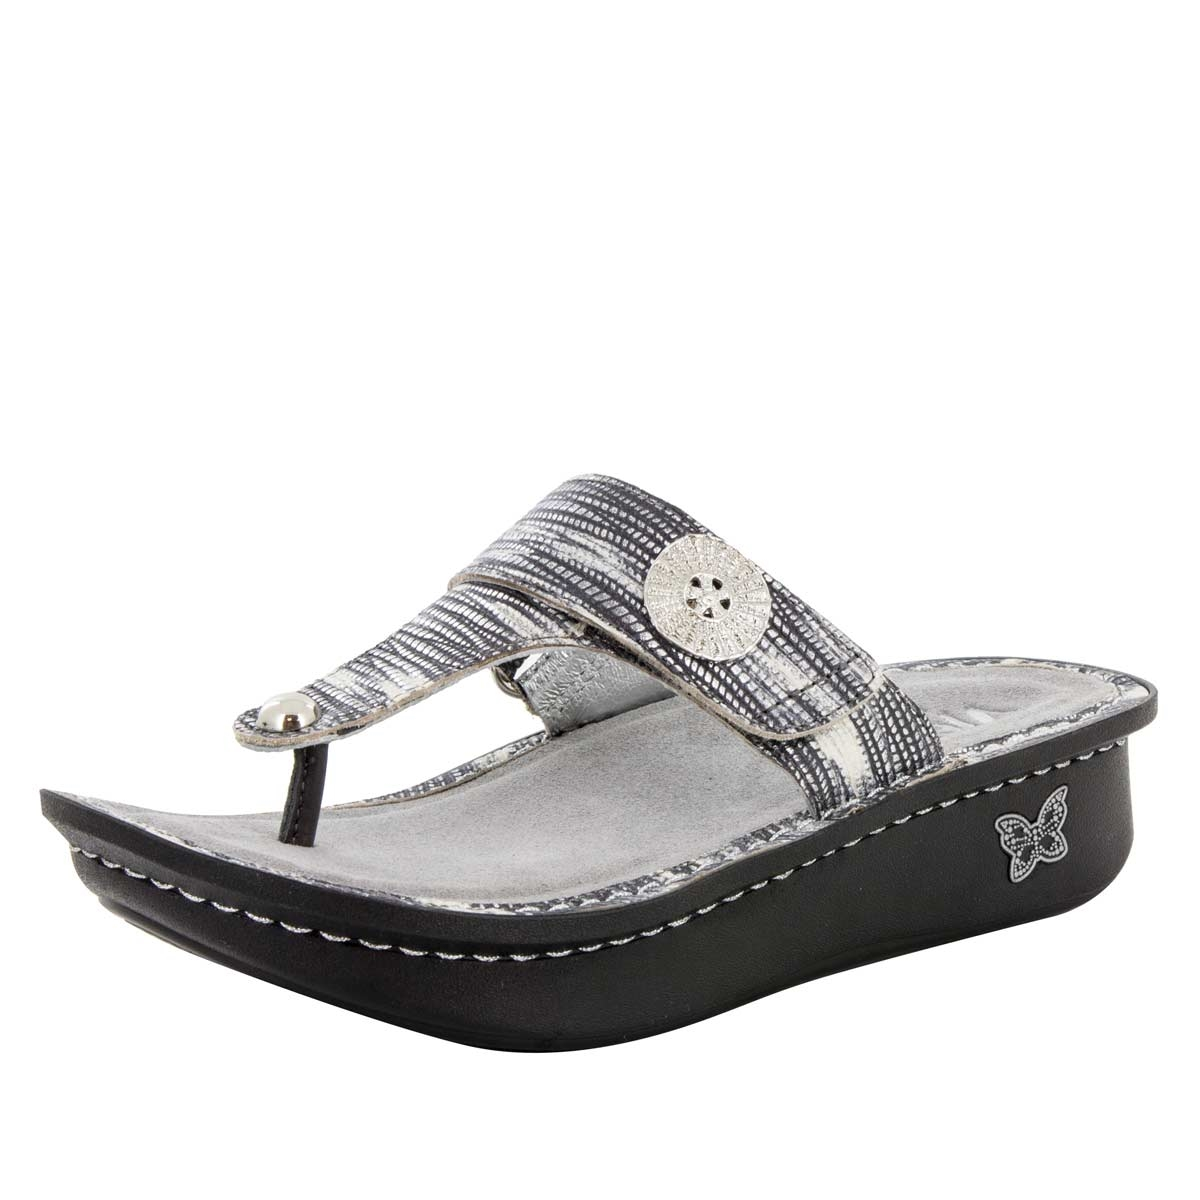 Alegria Women's Carina Thong Sandals S9Le2T